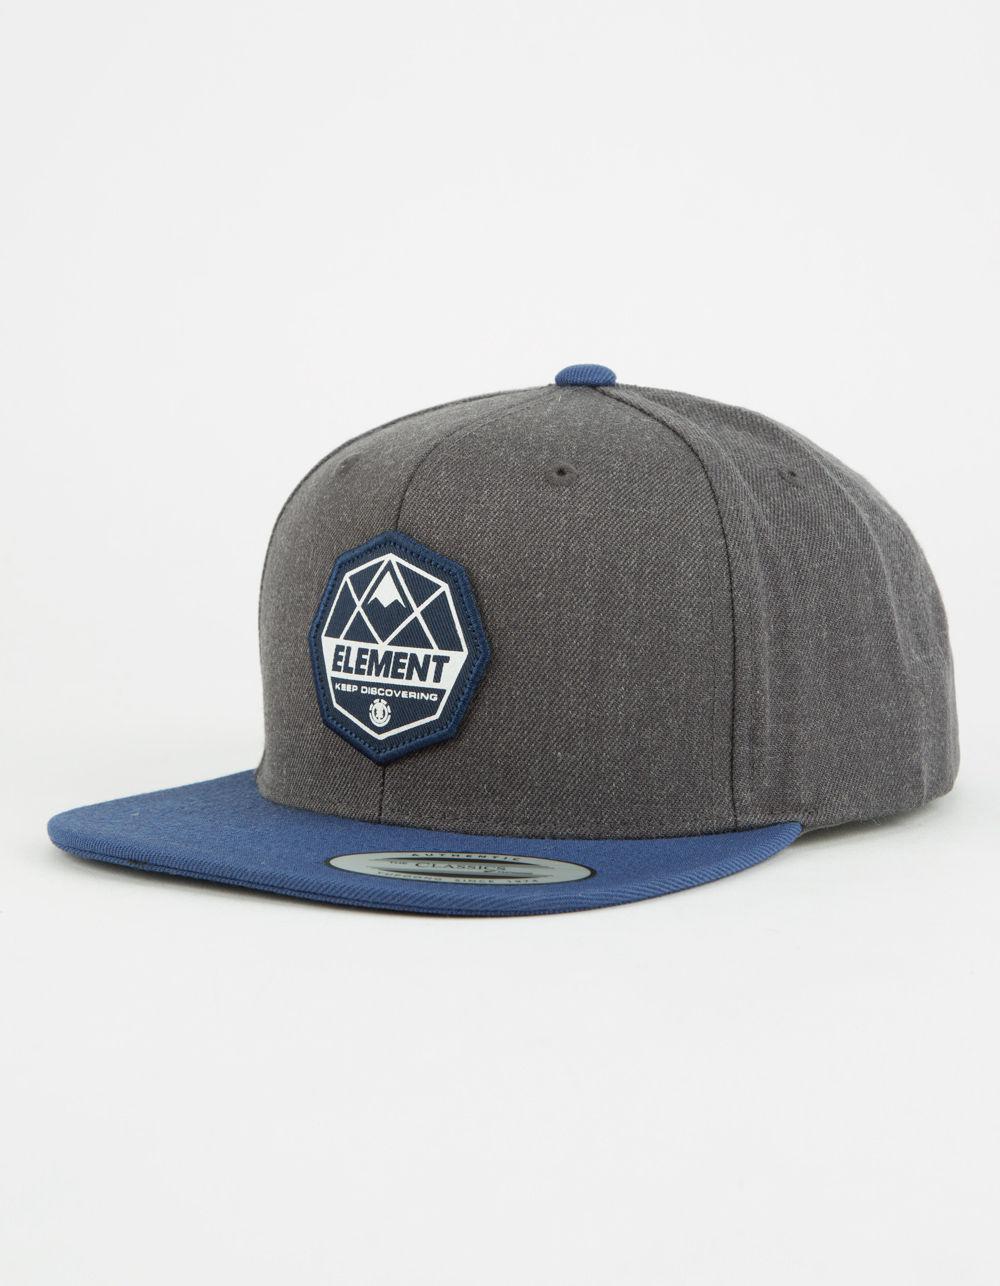 Lyst - Element Stroller Cap Mens Snapback Hat for Men d960697b27c7